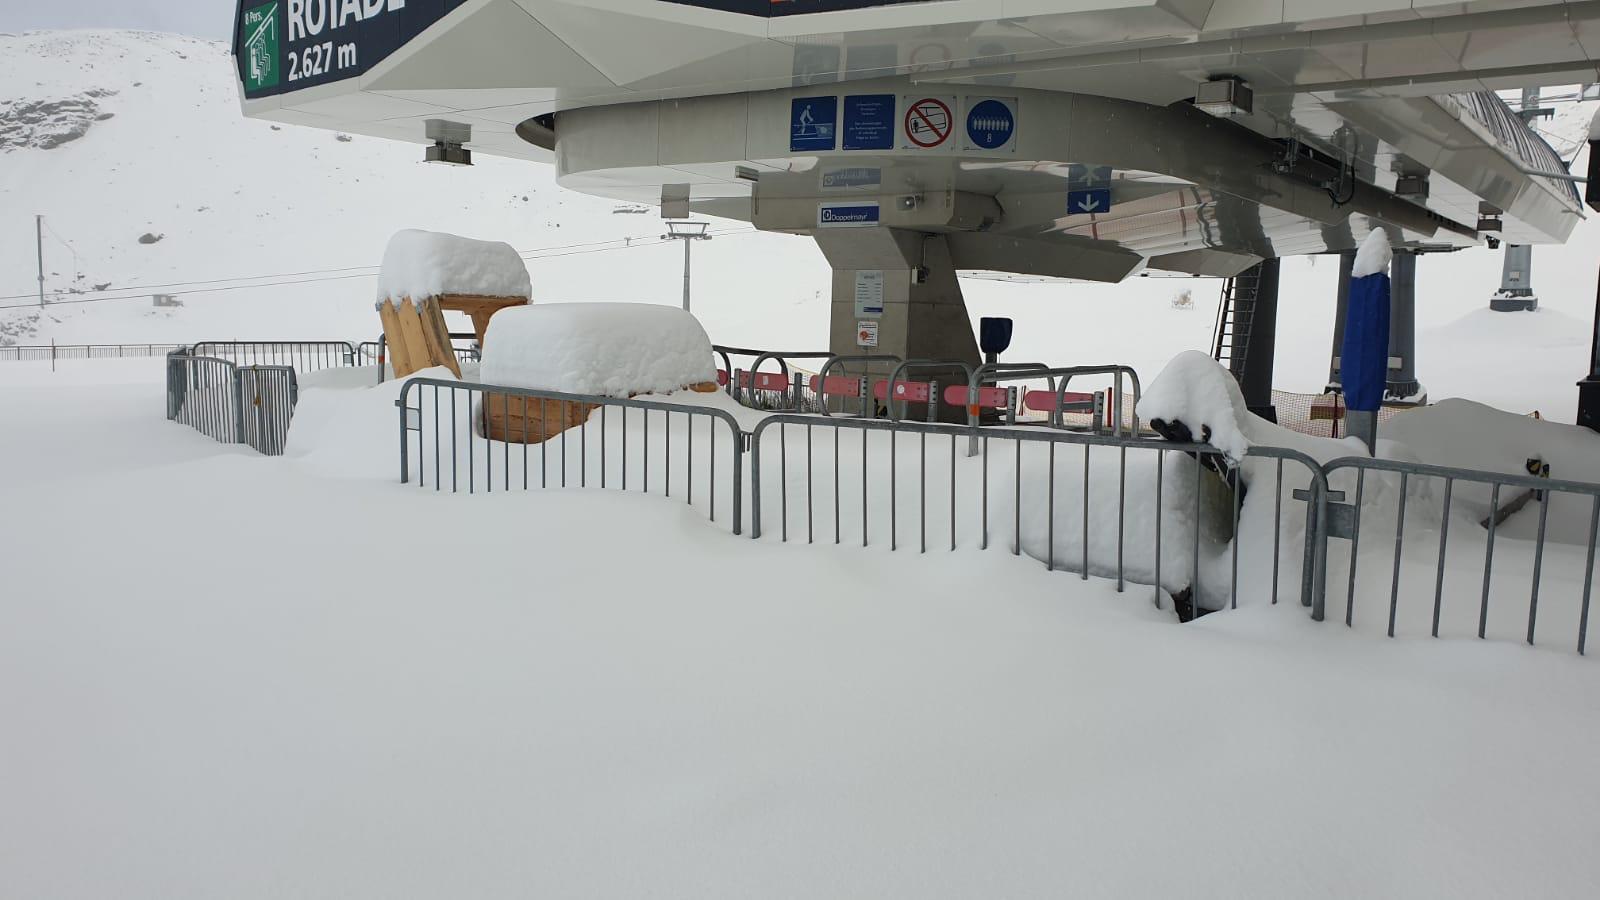 europe, stubaier gletscher, opening early, snow